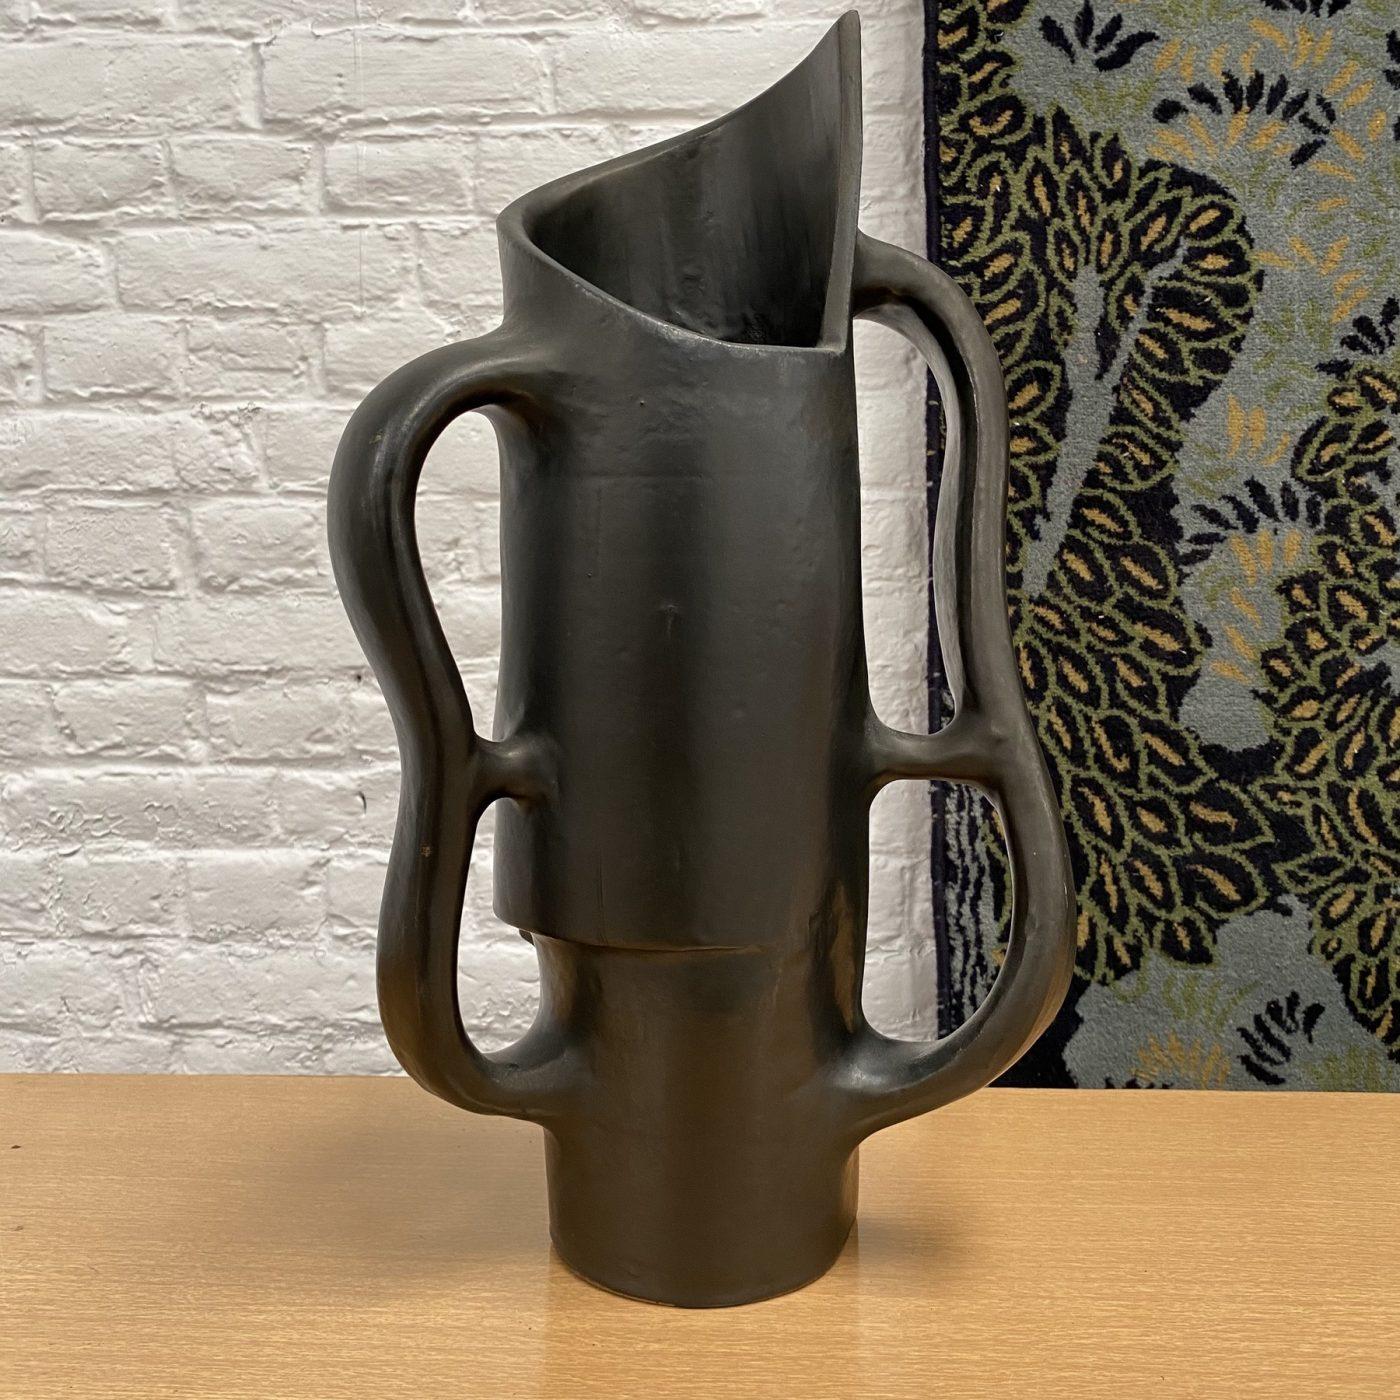 objet-vagabond-ceramic-sculpture0000